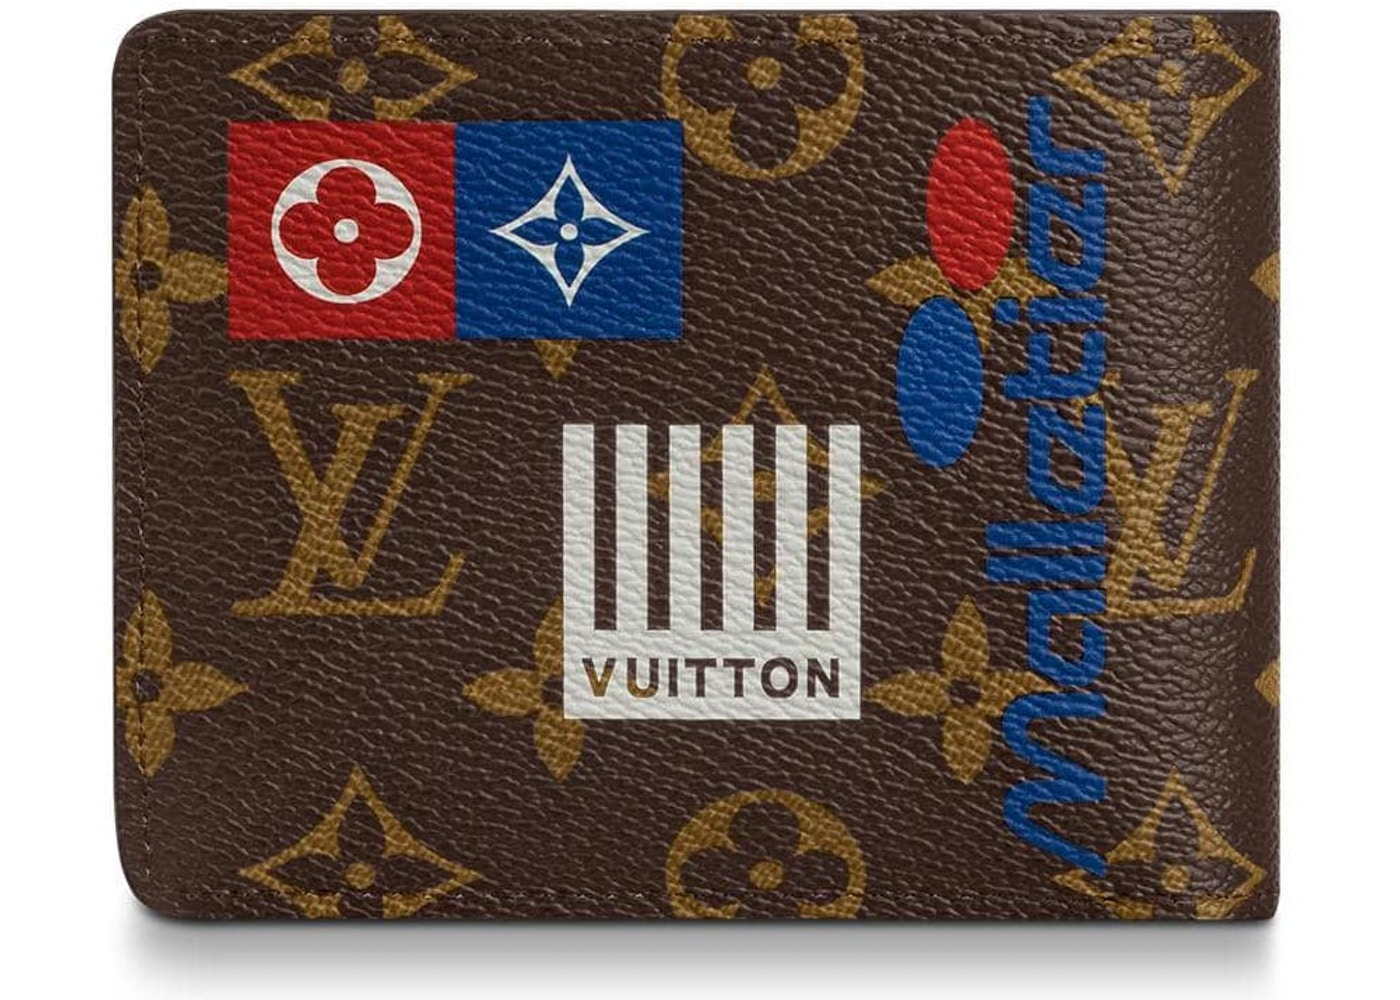 491d1e50486 Buy & Sell Luxury Handbags - New Lowest Asks